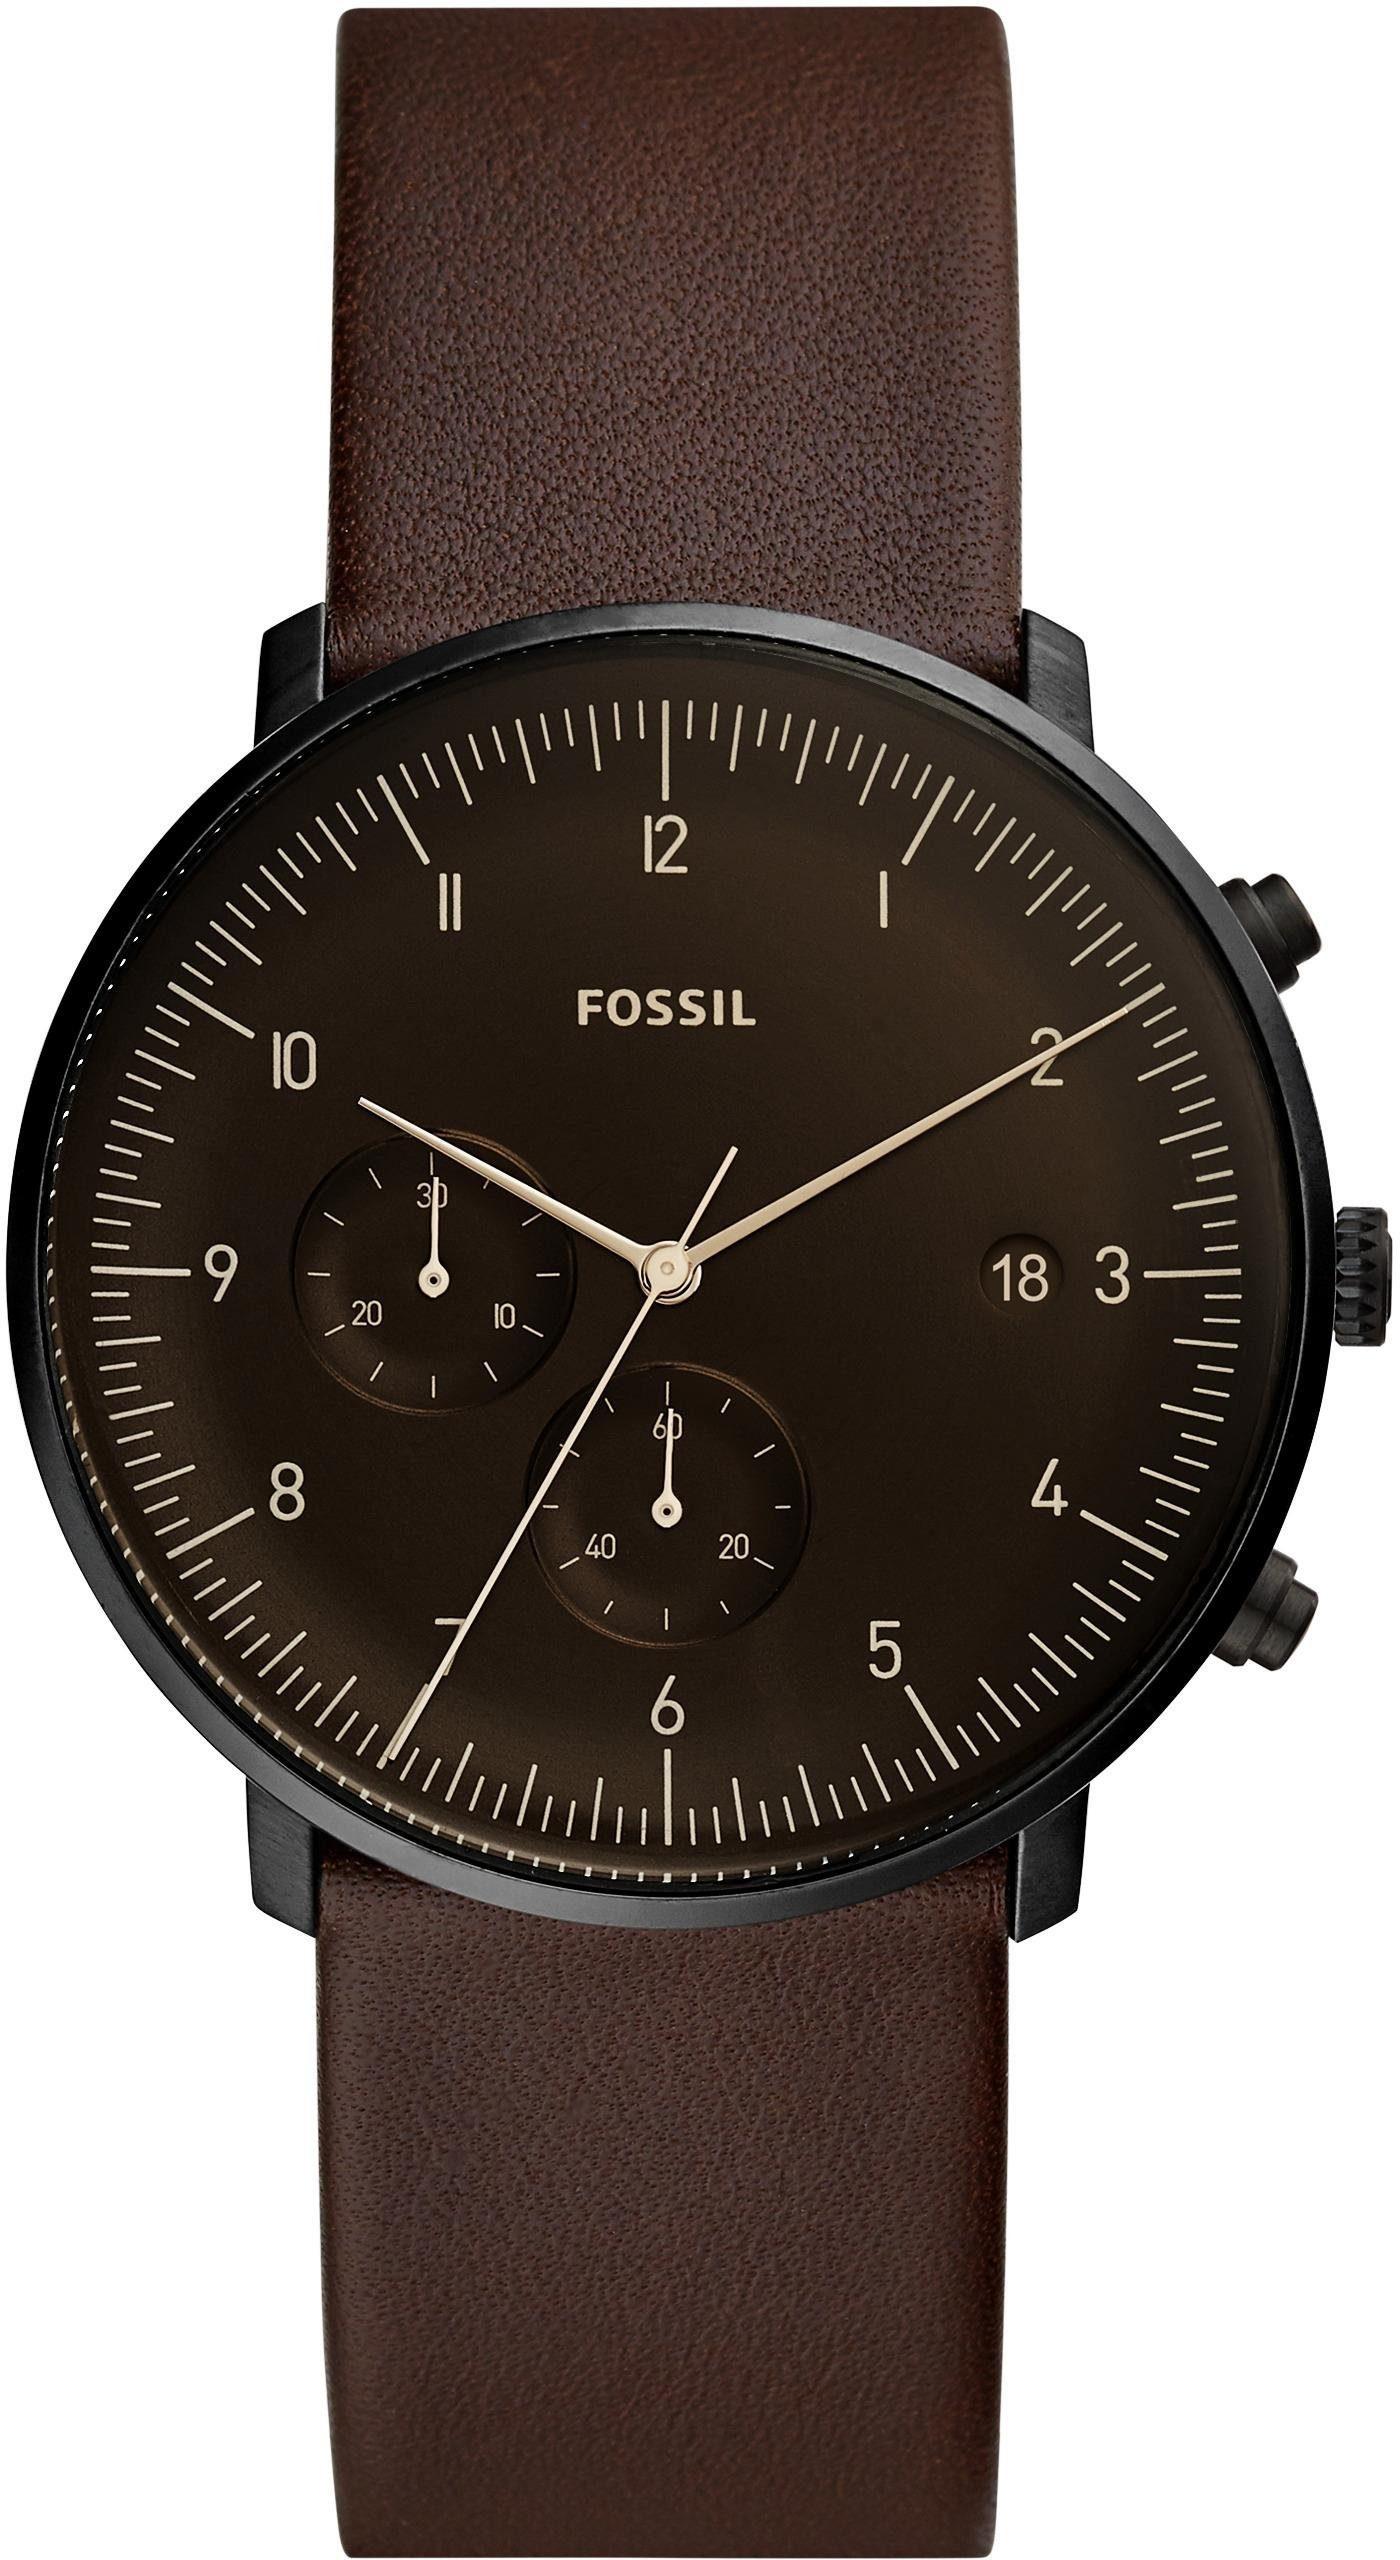 Fossil Chronograph »CHASE TIMER, FS5485« mit bernsteinfarbenem Mineralglas